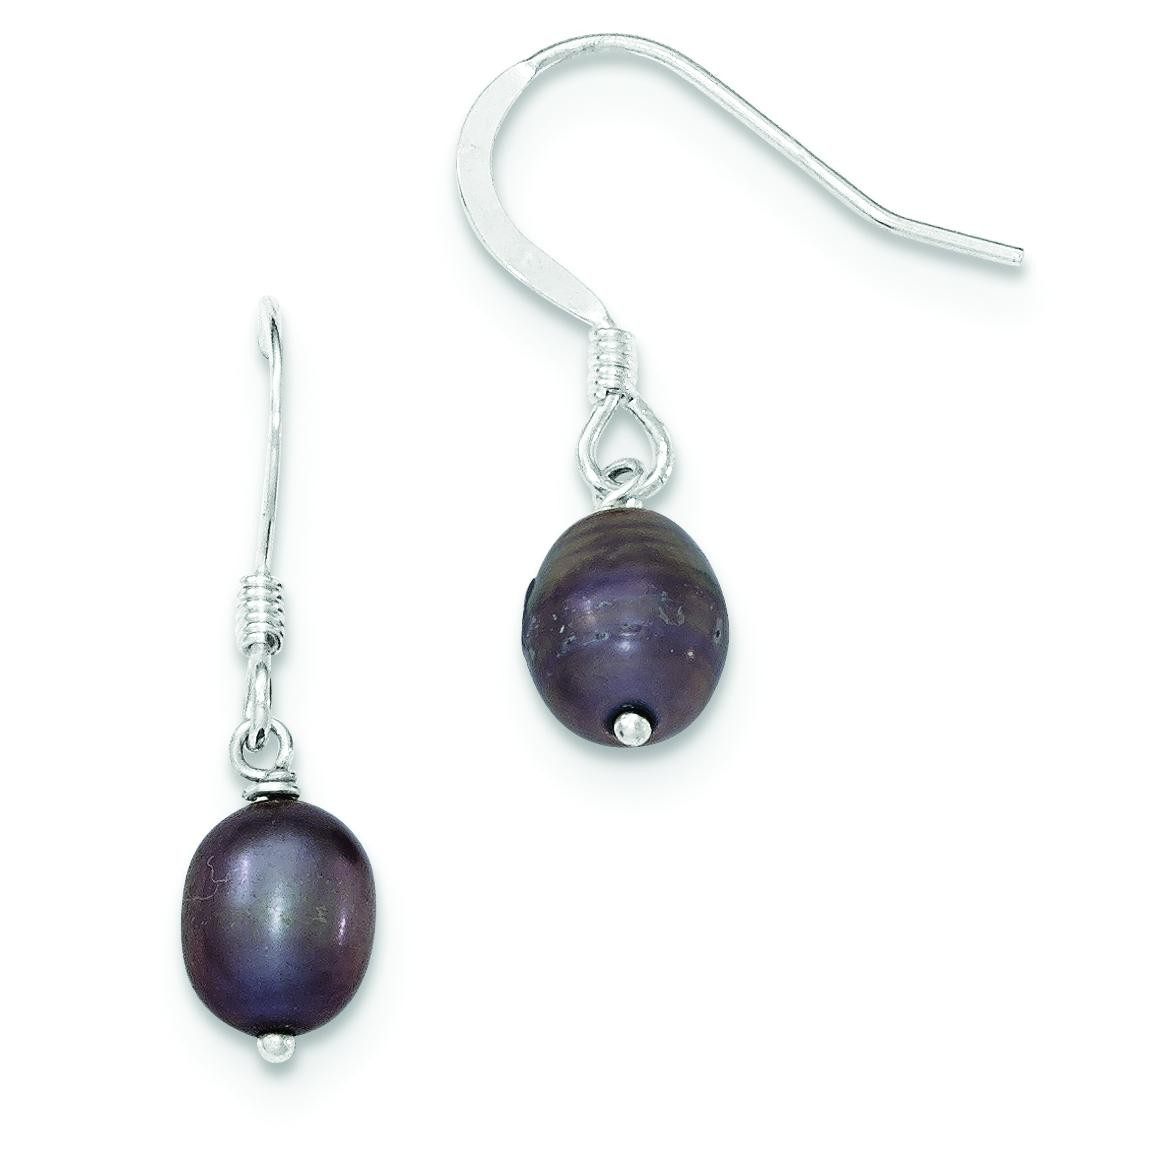 Black Cultured Freshwater Pearl Earrings in Sterling Silver